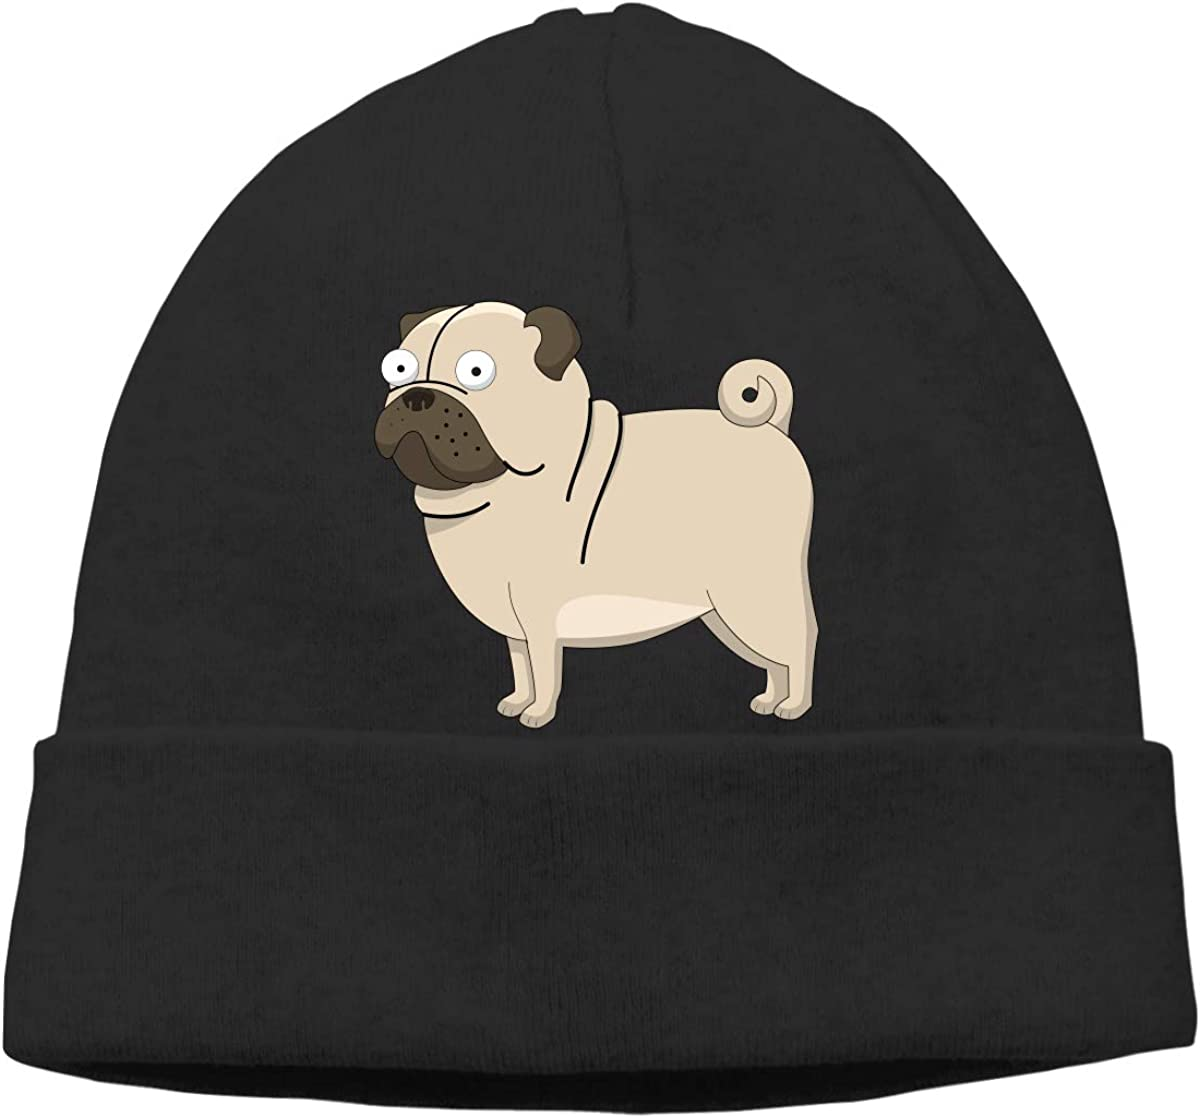 Puppy Cute Pug Unisex Cuffed Plain Skull Knitted Hat Beanie Cap Men Women Black